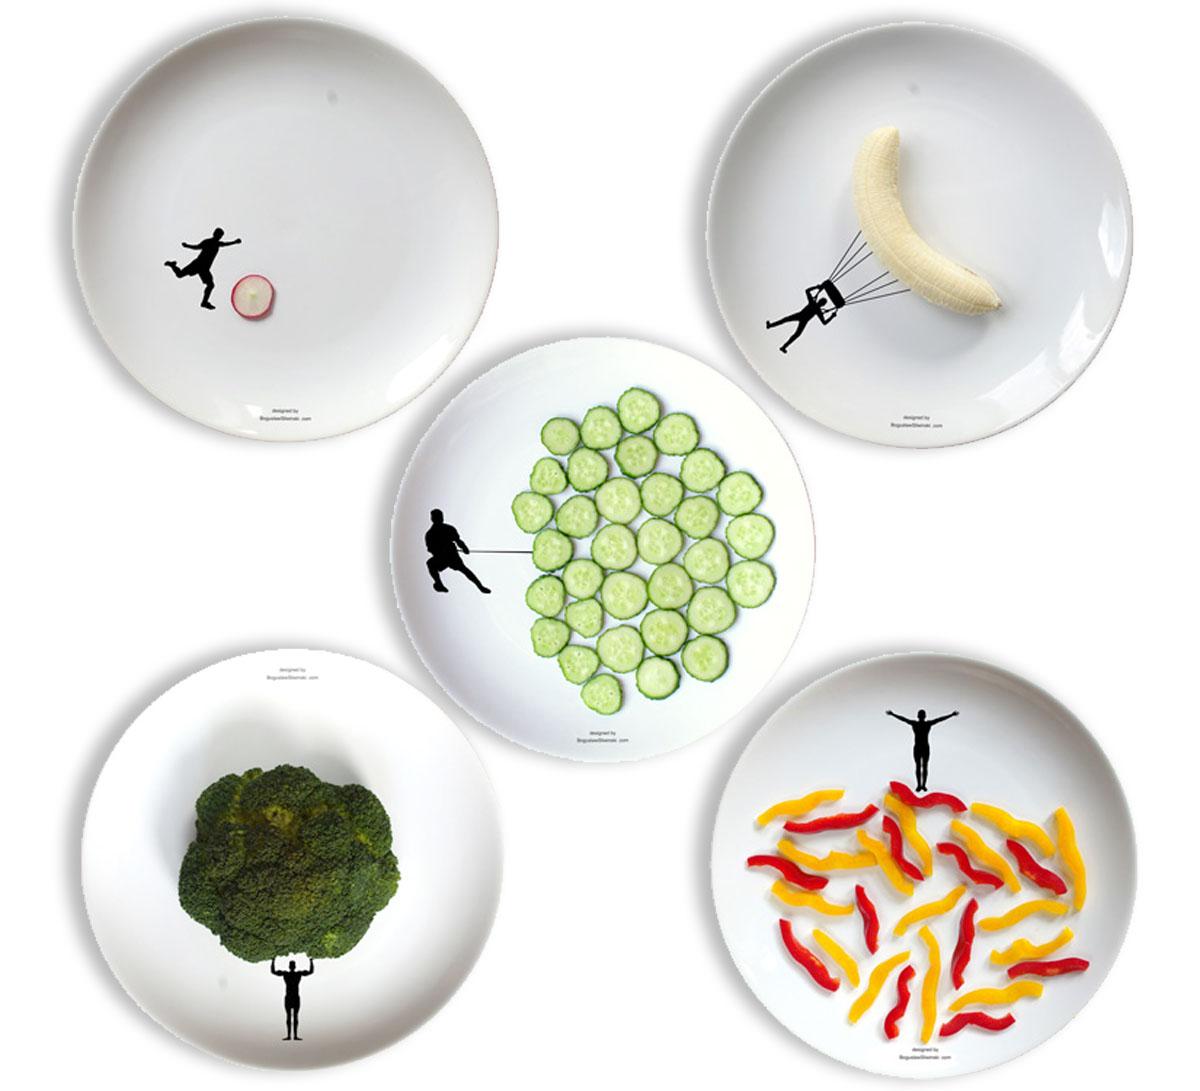 New Sport Dinner Plates For Interactive Food Fun By Designer Boguslaw Sliwi?ski.  sc 1 st  Super Bowl Update - Blogger & Super Bowl Update: New Sport Dinner Plates For Interactive Food Fun ...